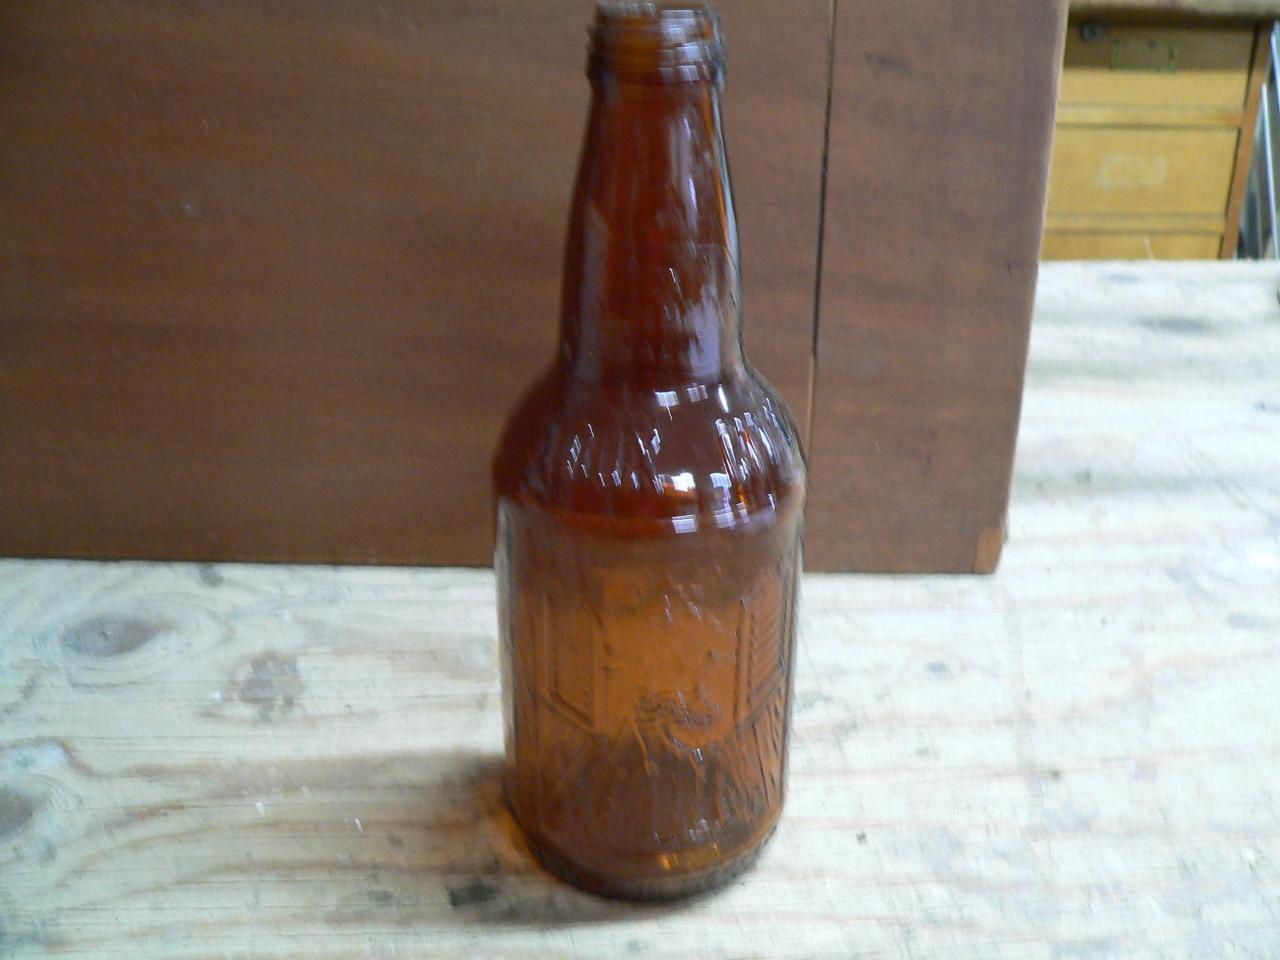 Bouteille biere sarsaparilla sioux city # 4556.9